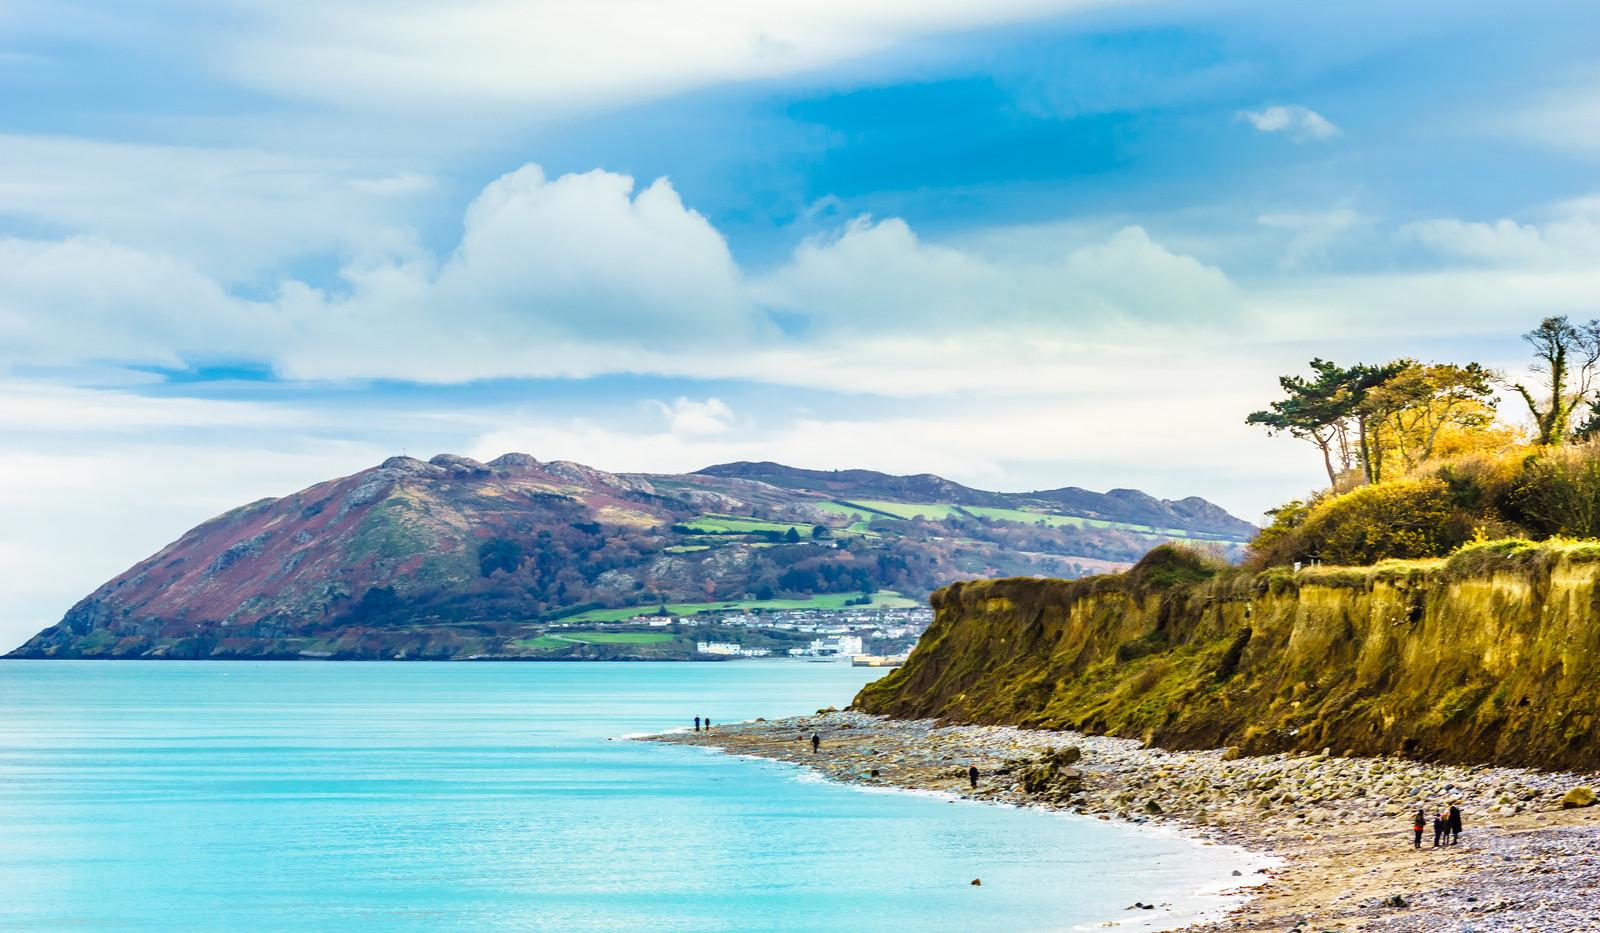 Canva - coast and beach of the Irish sea